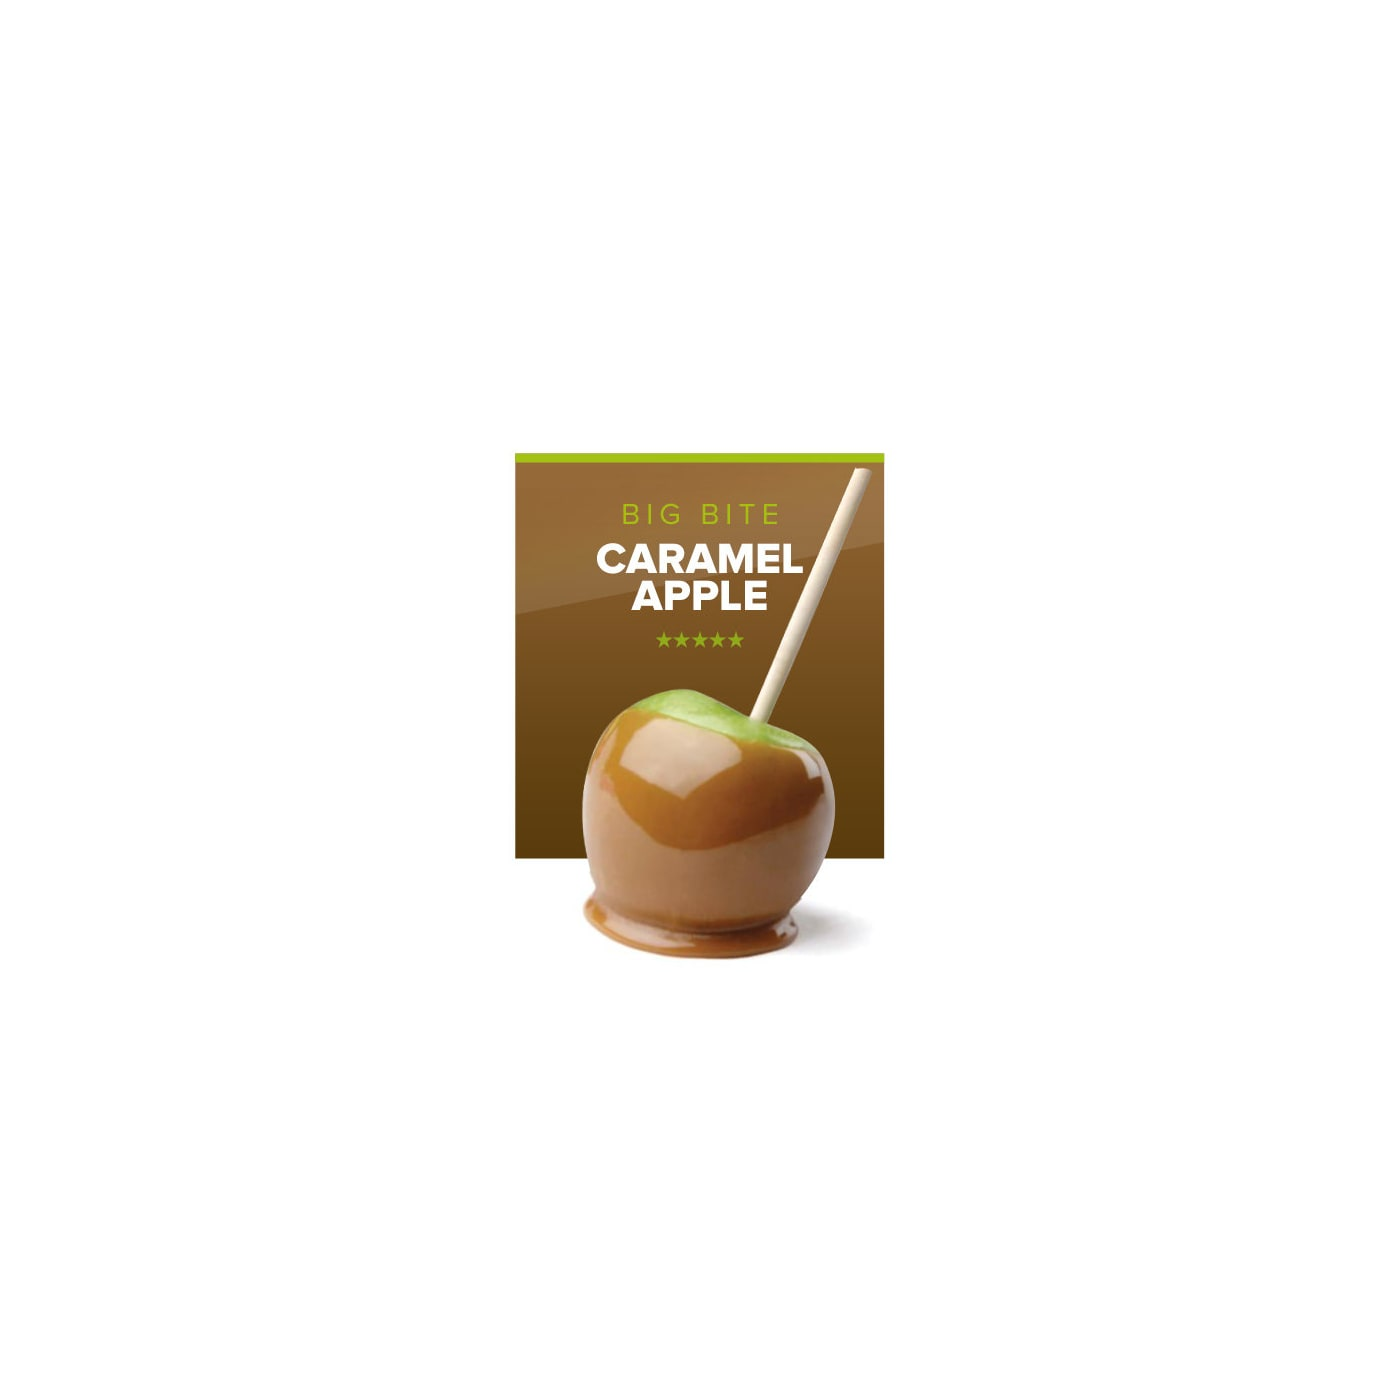 Big Bite Caramel Apple